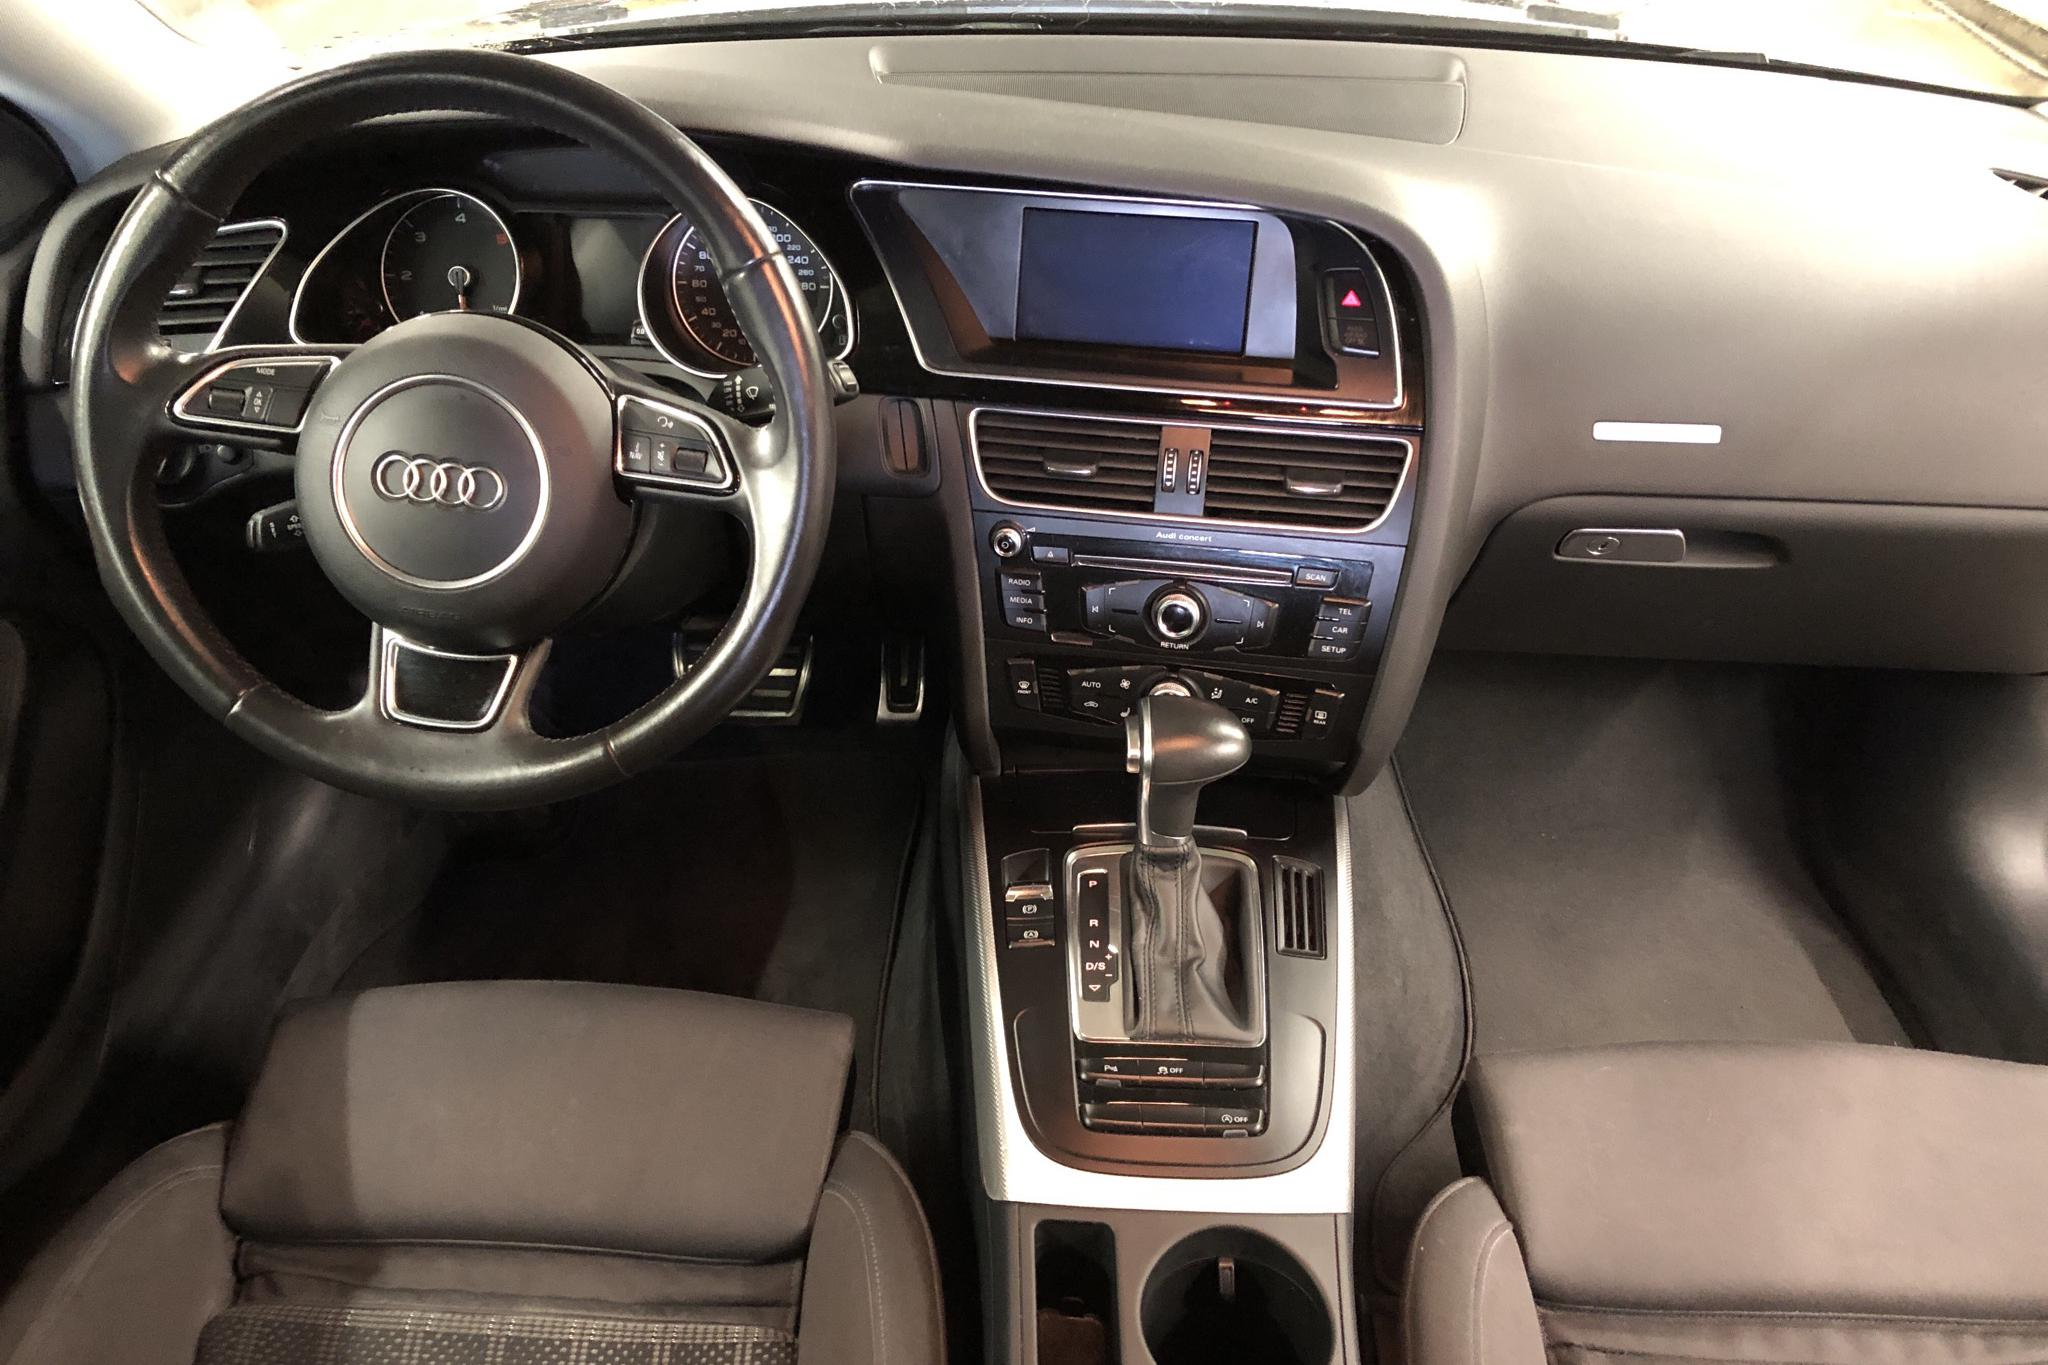 Audi A5 2.0 TDI Clean diesel Sportback quattro (190hk) - 189 560 km - Automatic - black - 2016